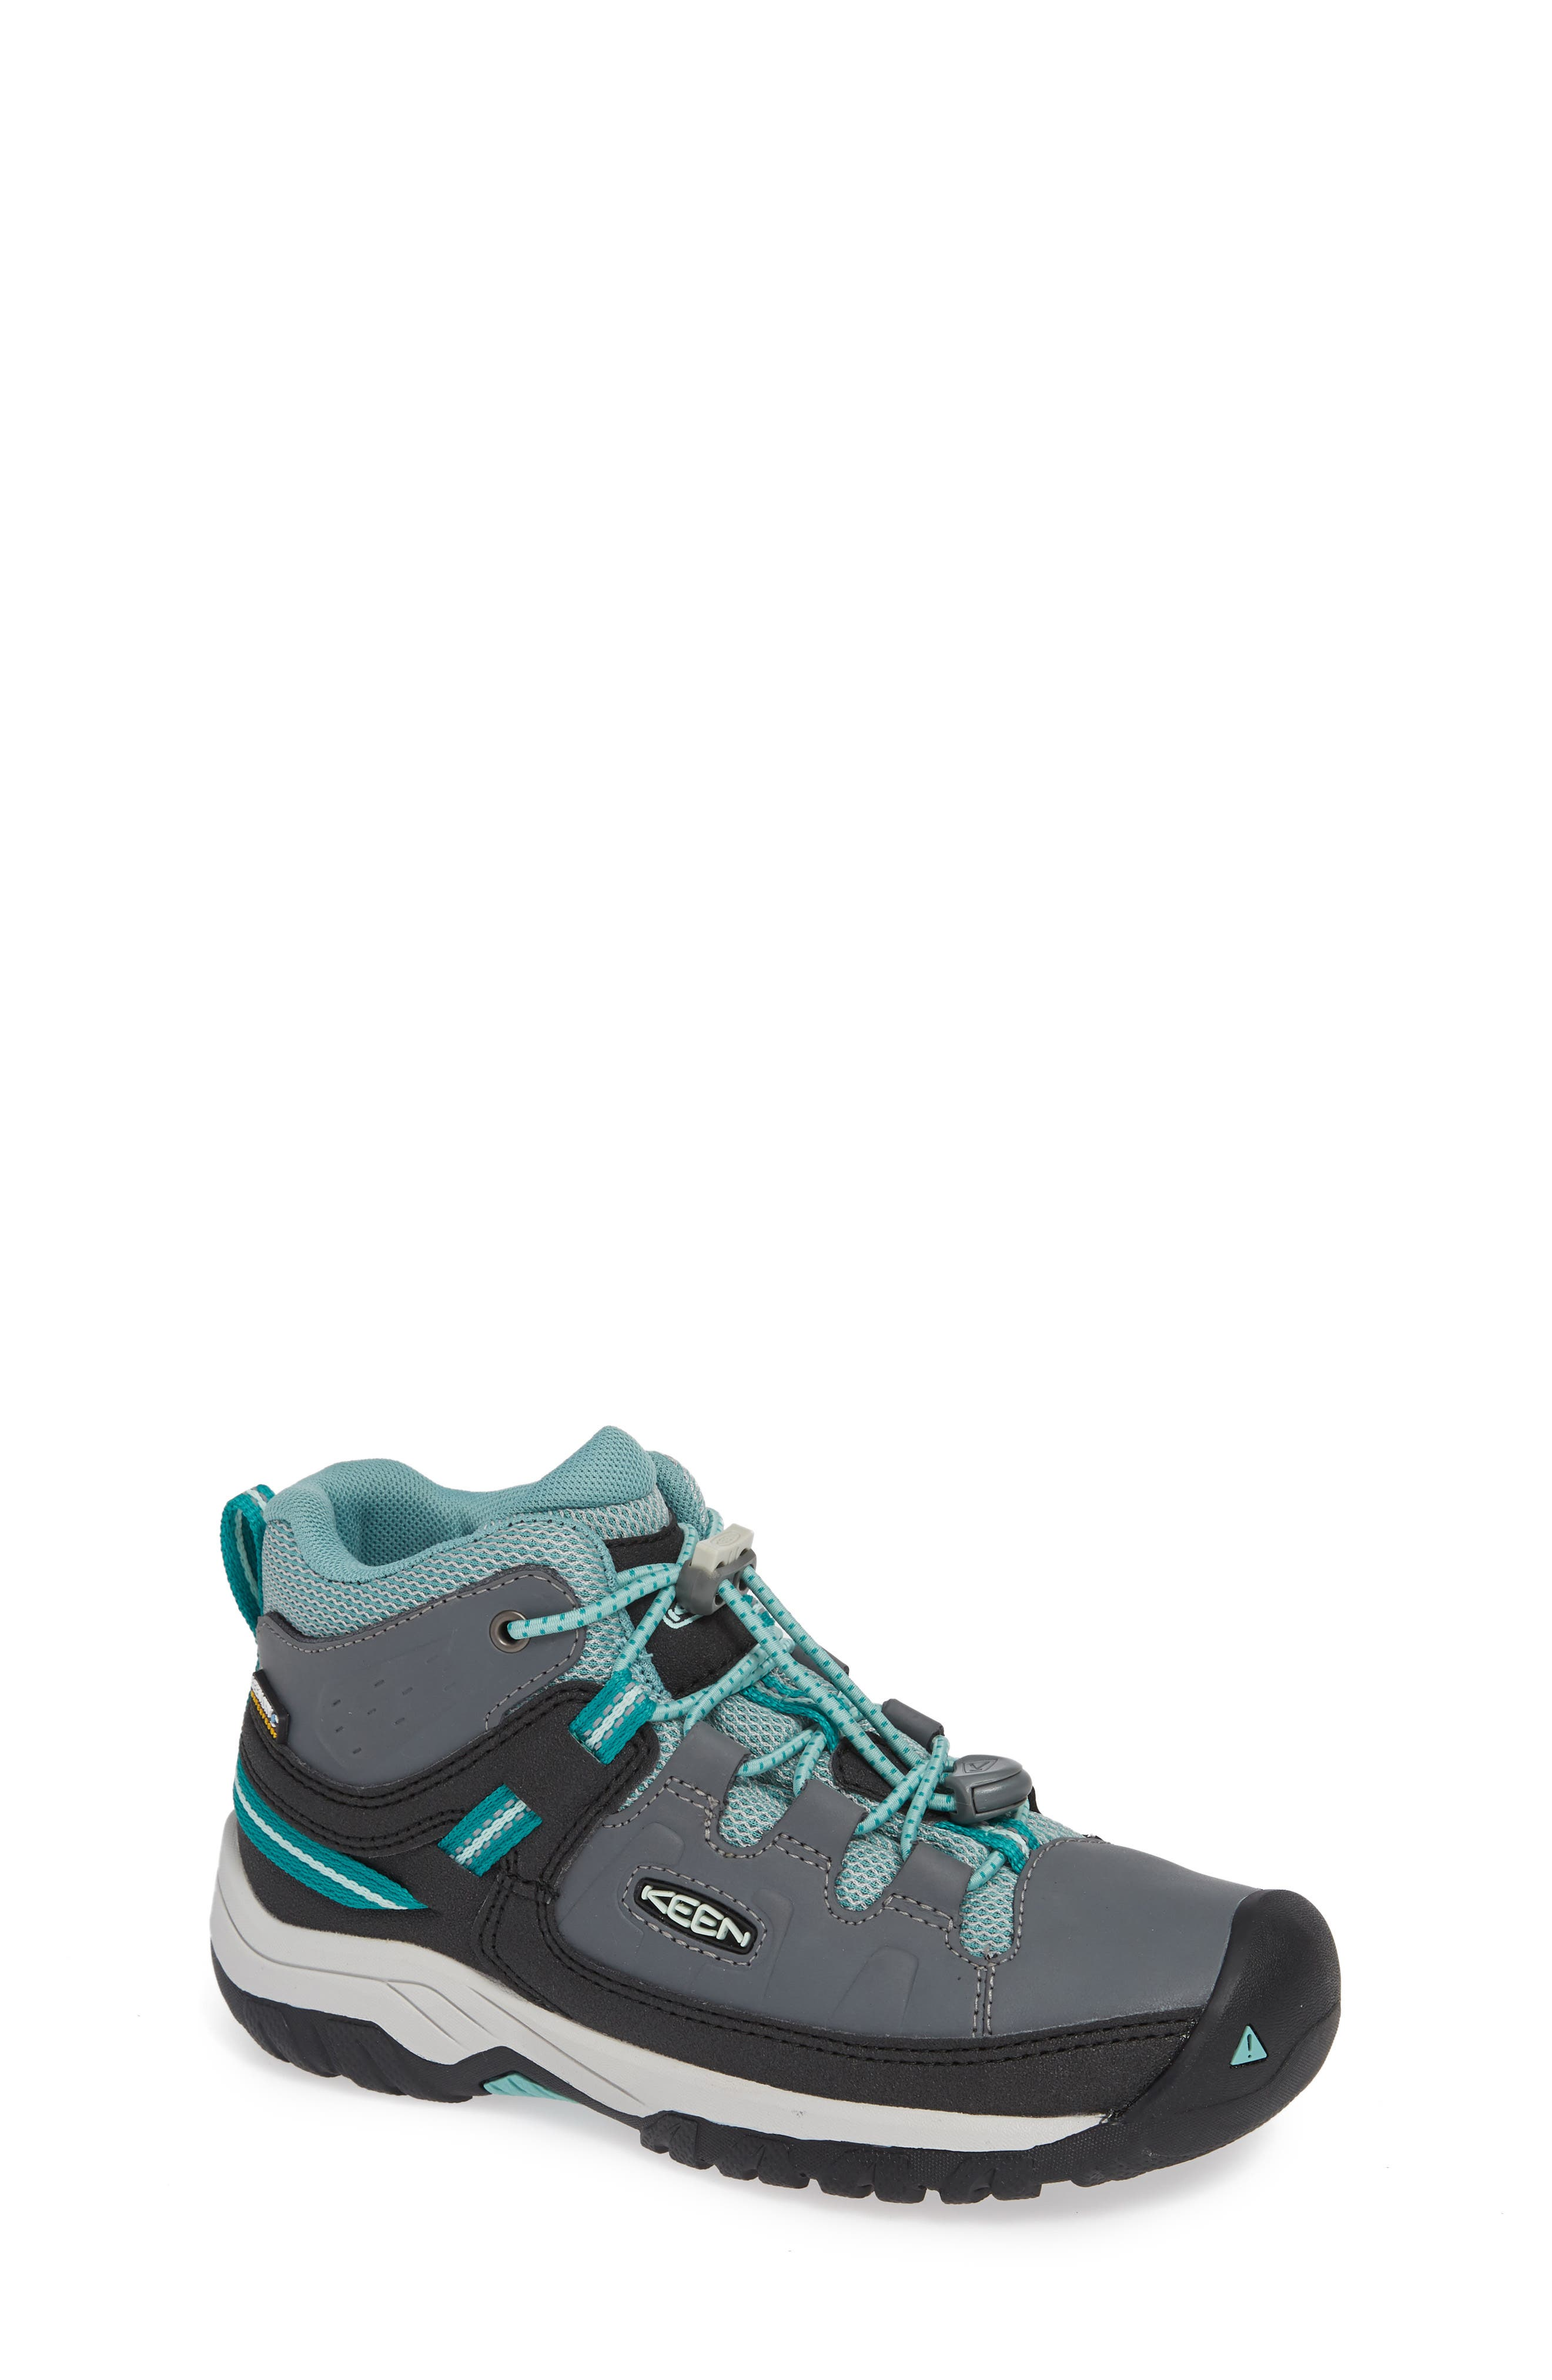 Targhee Mid Waterproof Hiking Boot,                             Main thumbnail 1, color,                             GREY/ WASABI